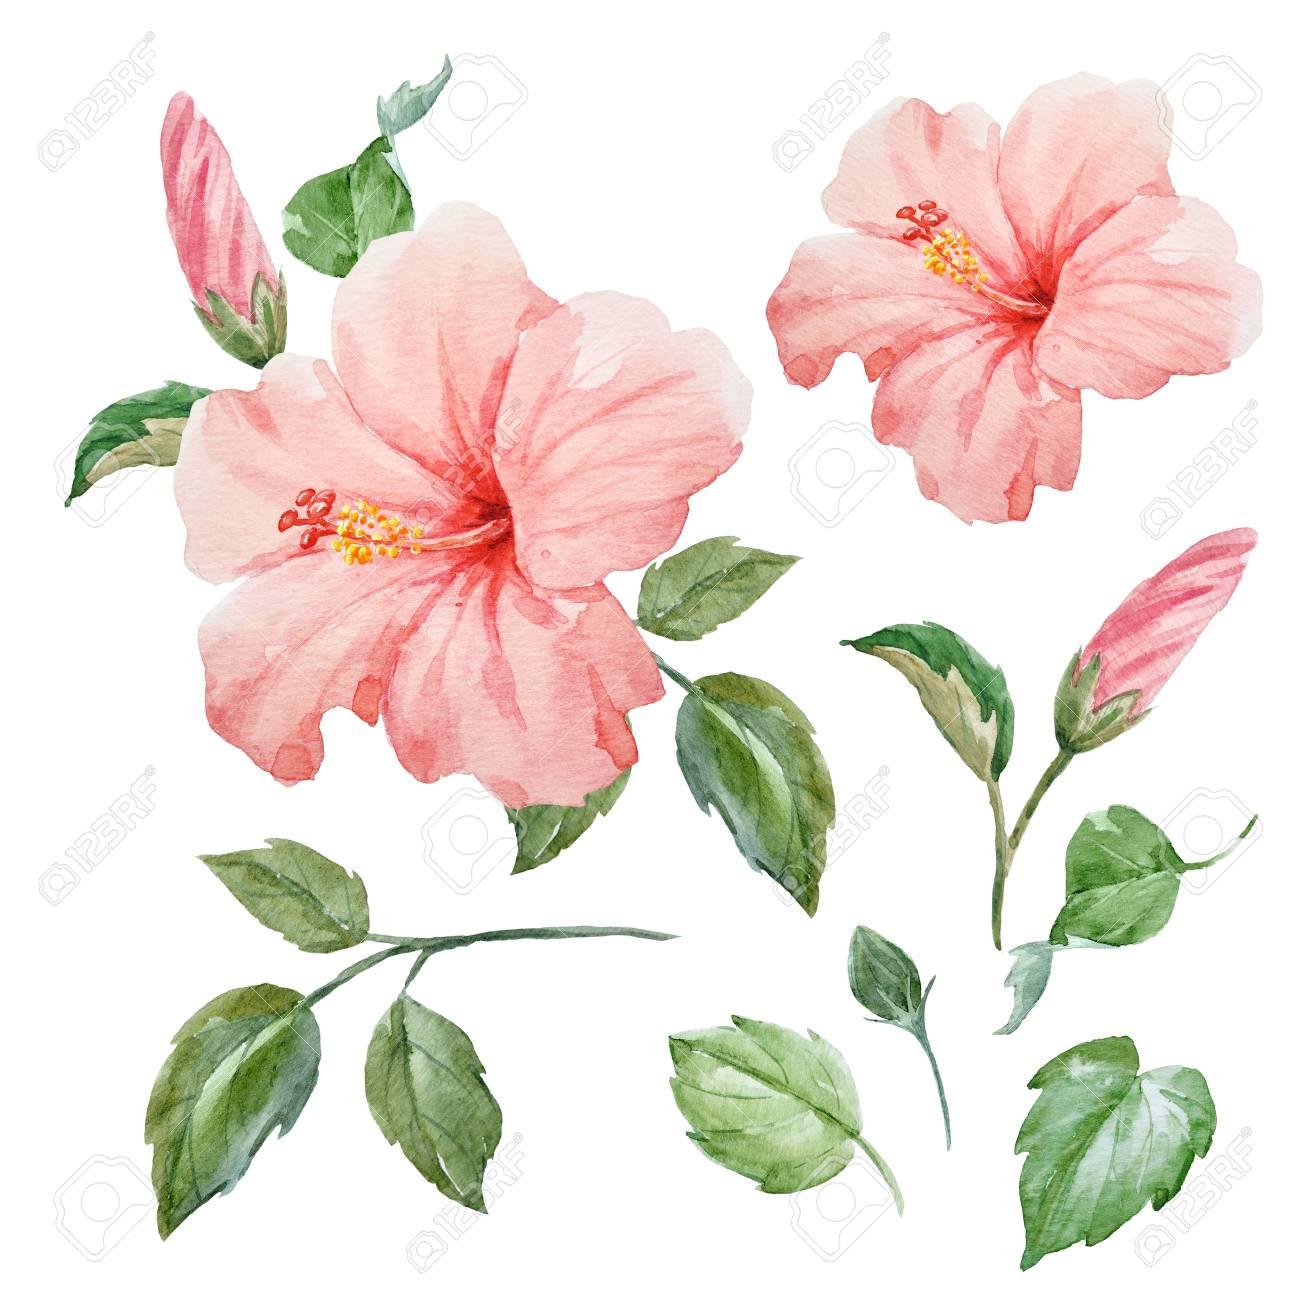 Watercolor tropical hibiscus flower stock photo picture and royalty stock photo watercolor tropical hibiscus flower izmirmasajfo